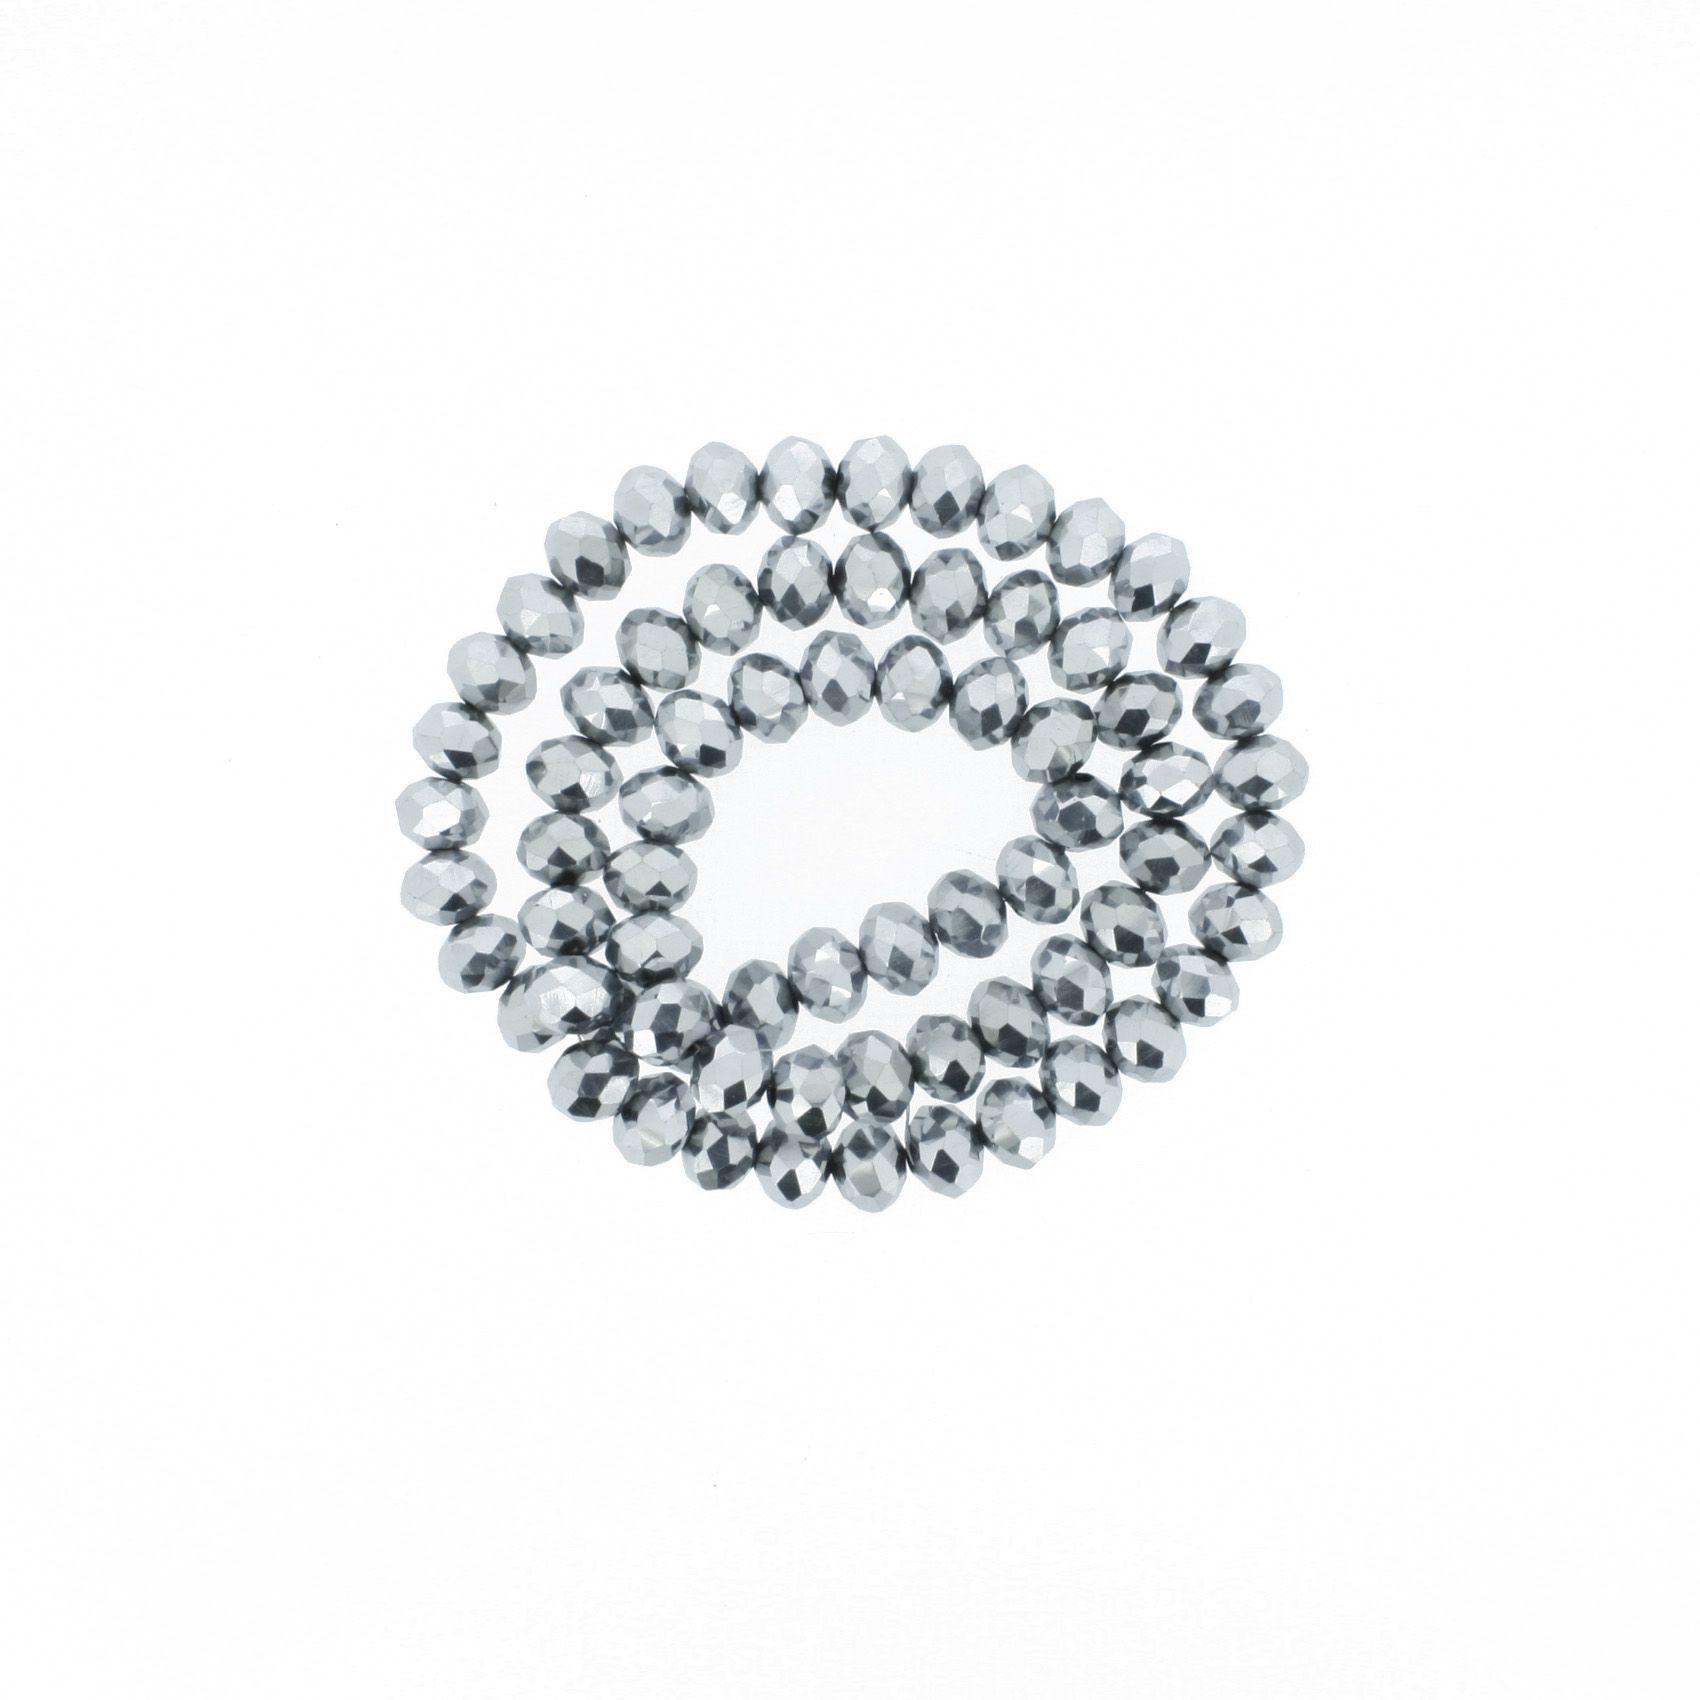 Fio de Cristal - Flat® - Prateado - 8mm  - Stéphanie Bijoux® - Peças para Bijuterias e Artesanato